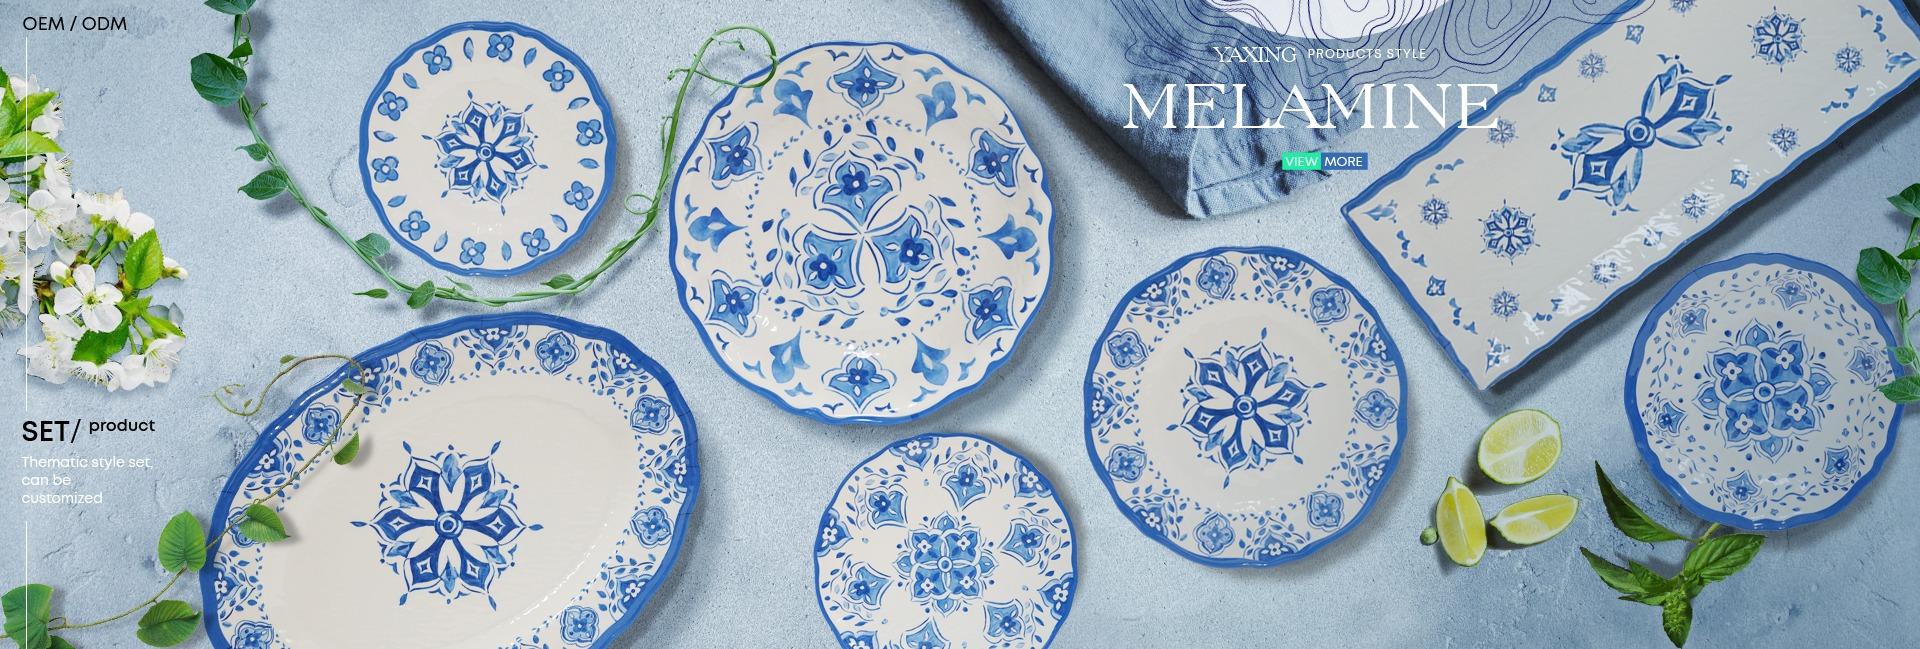 Quanzhou Yaxing Houseware Co , Ltd  - Melamine Tableware